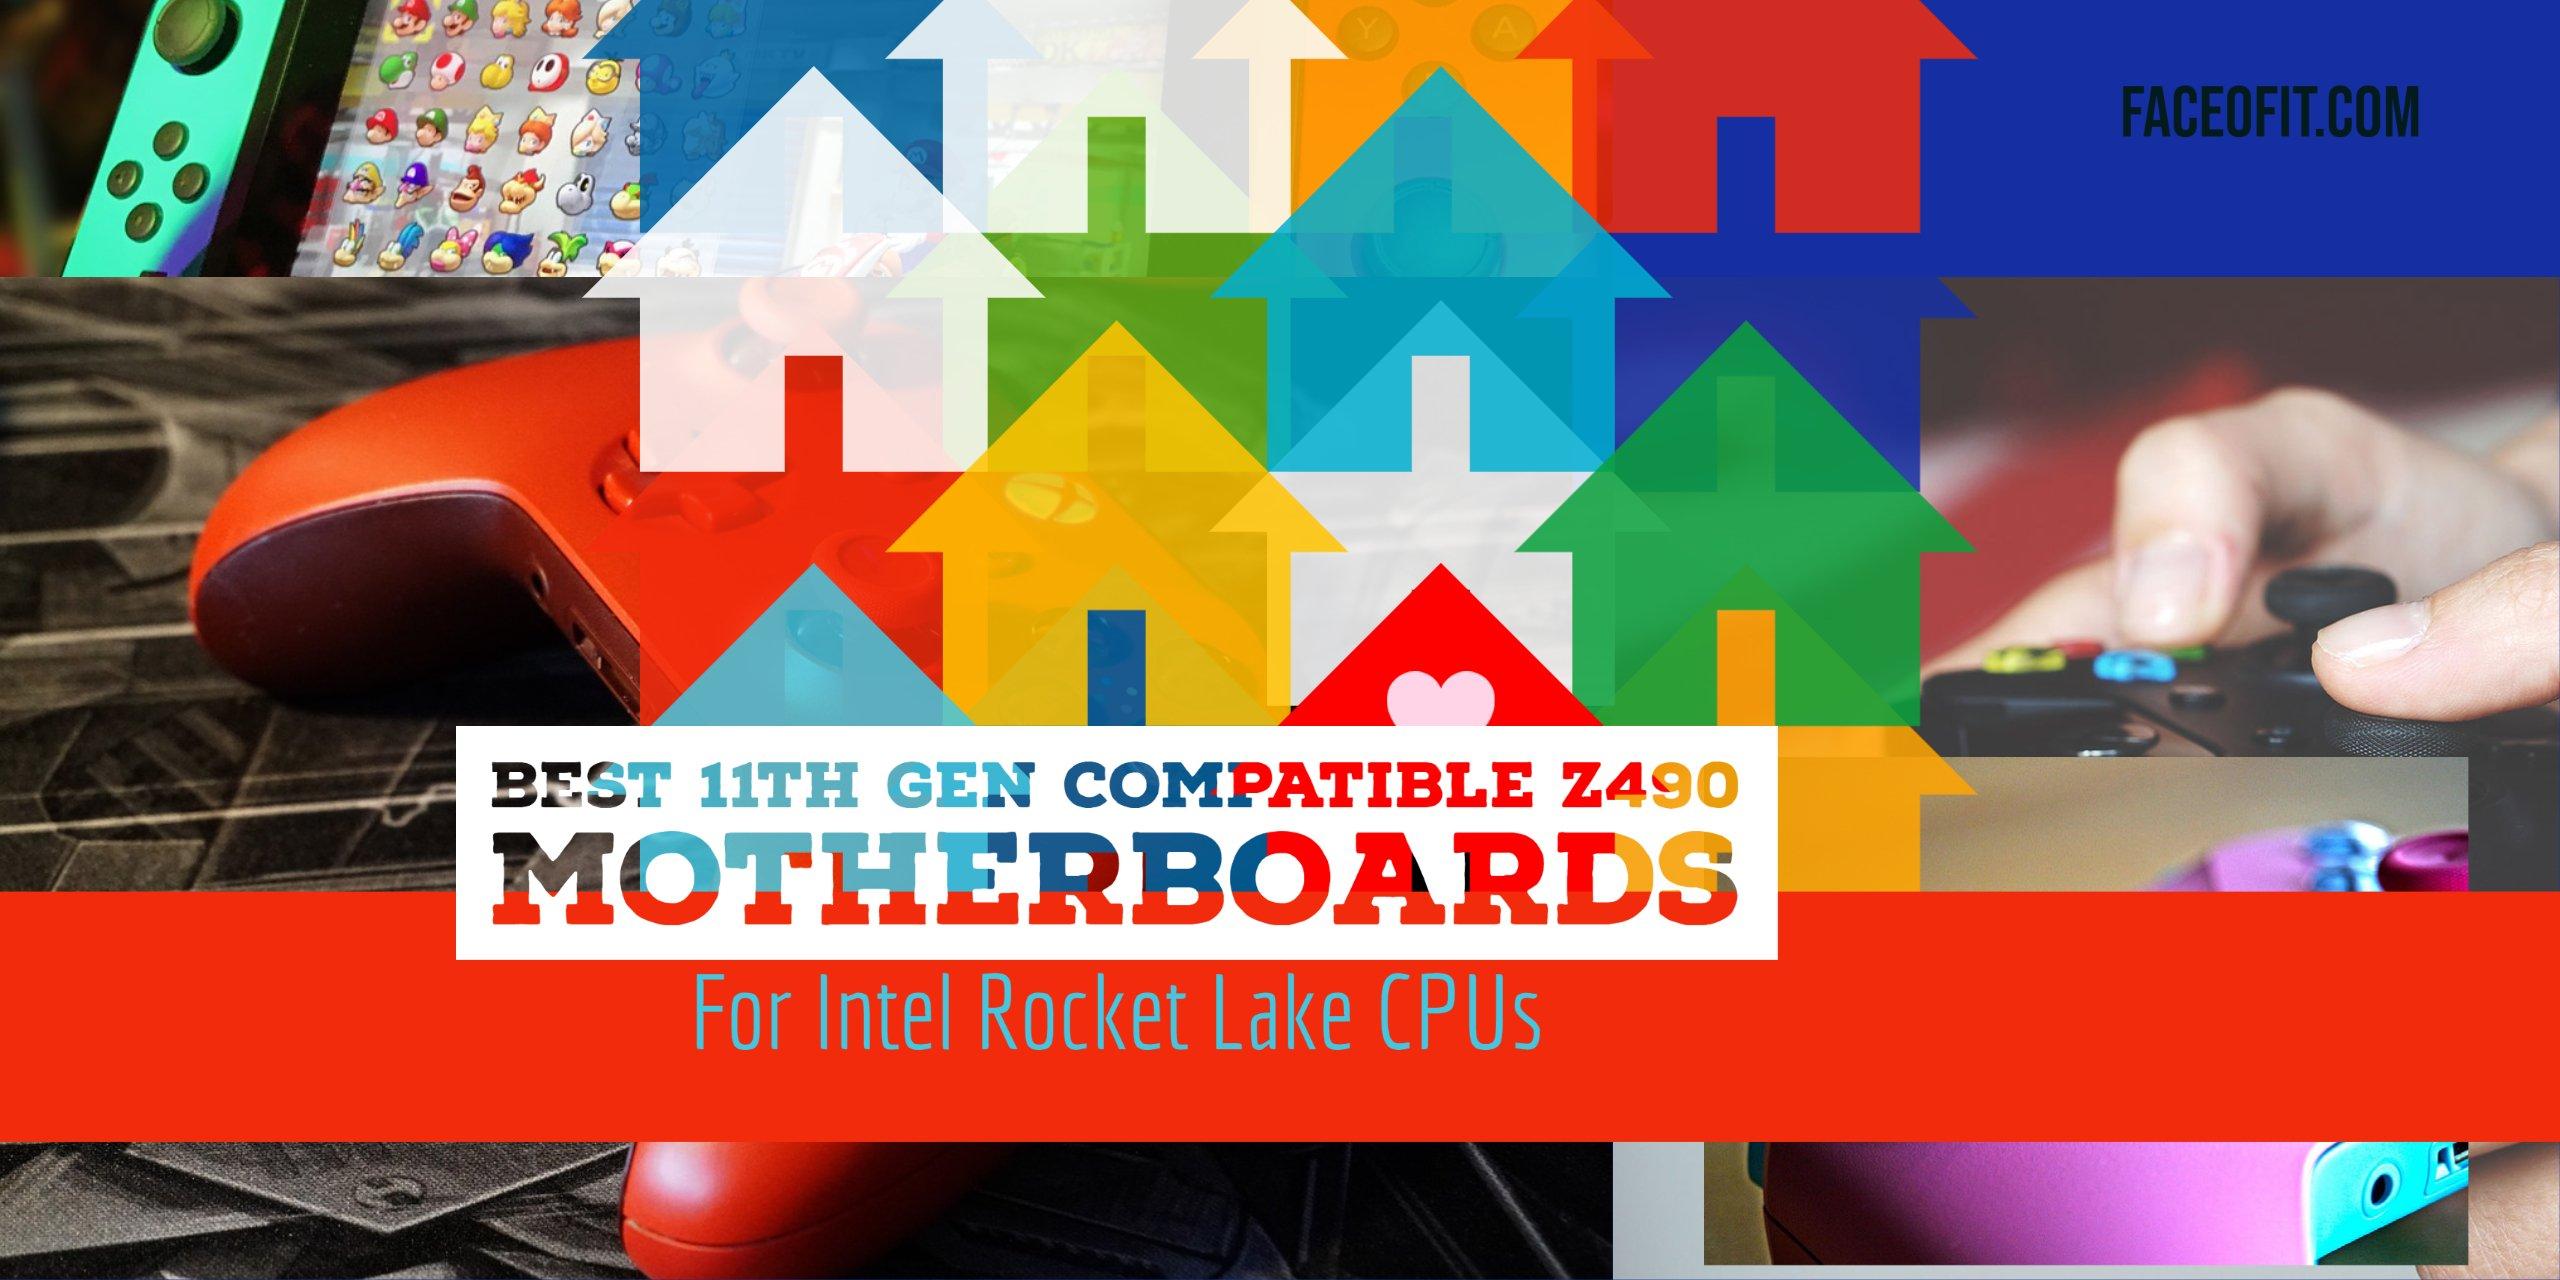 Best 11th Gen Compatible Z490 Motherboards with Rocket Lake 11900K